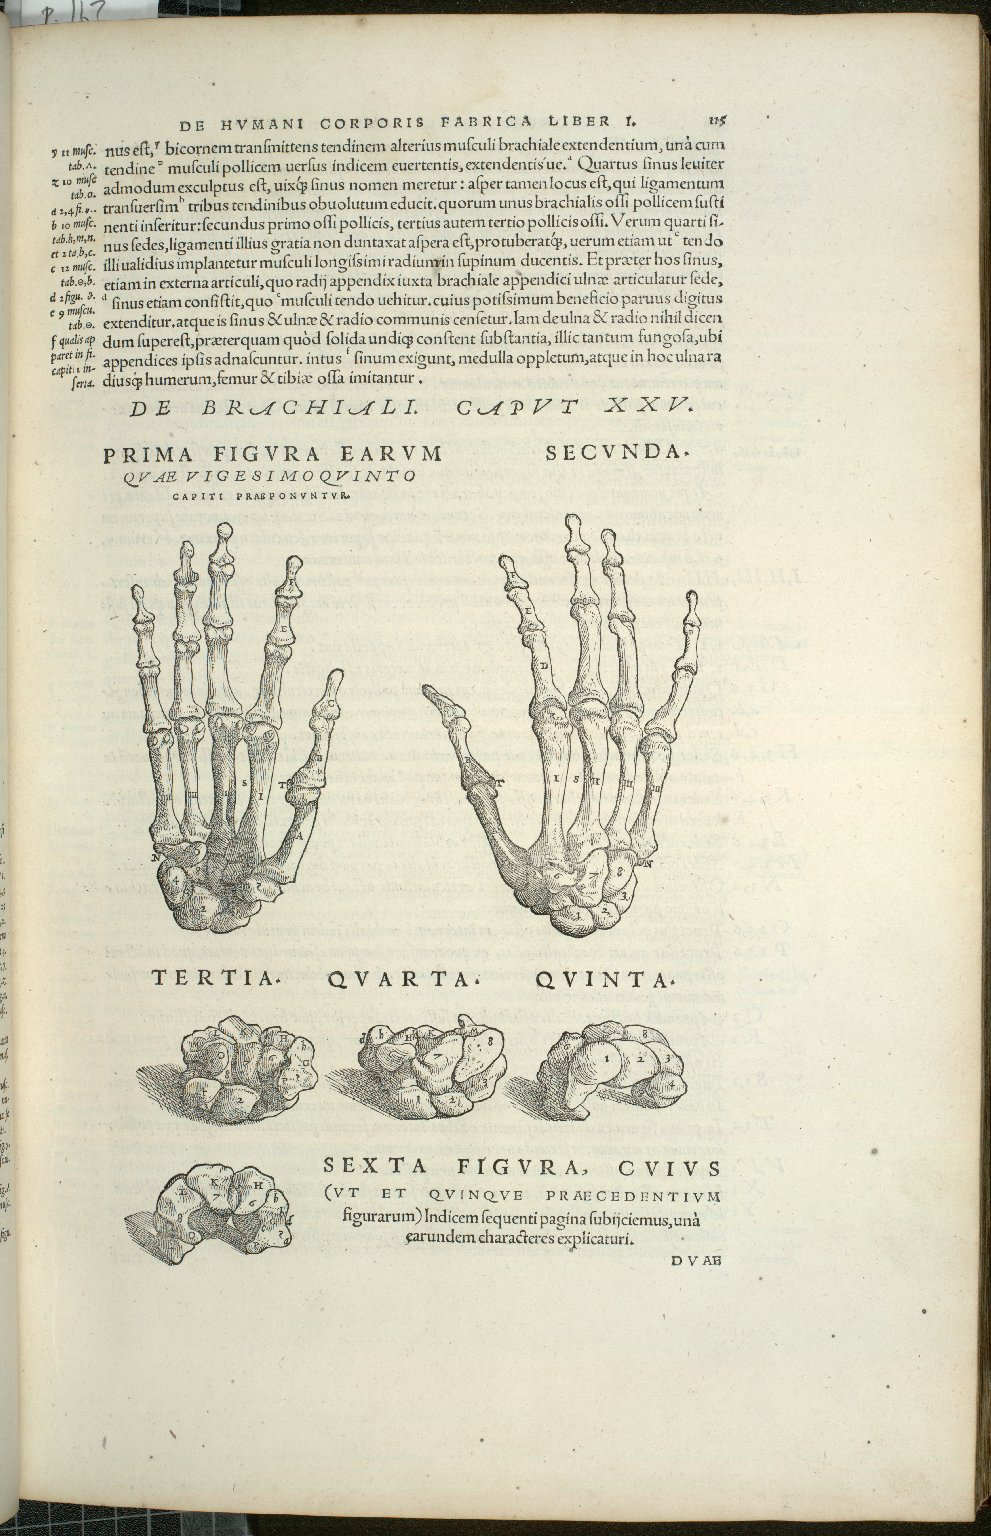 De Brachiali. Caput XXV. Fig.I-VI